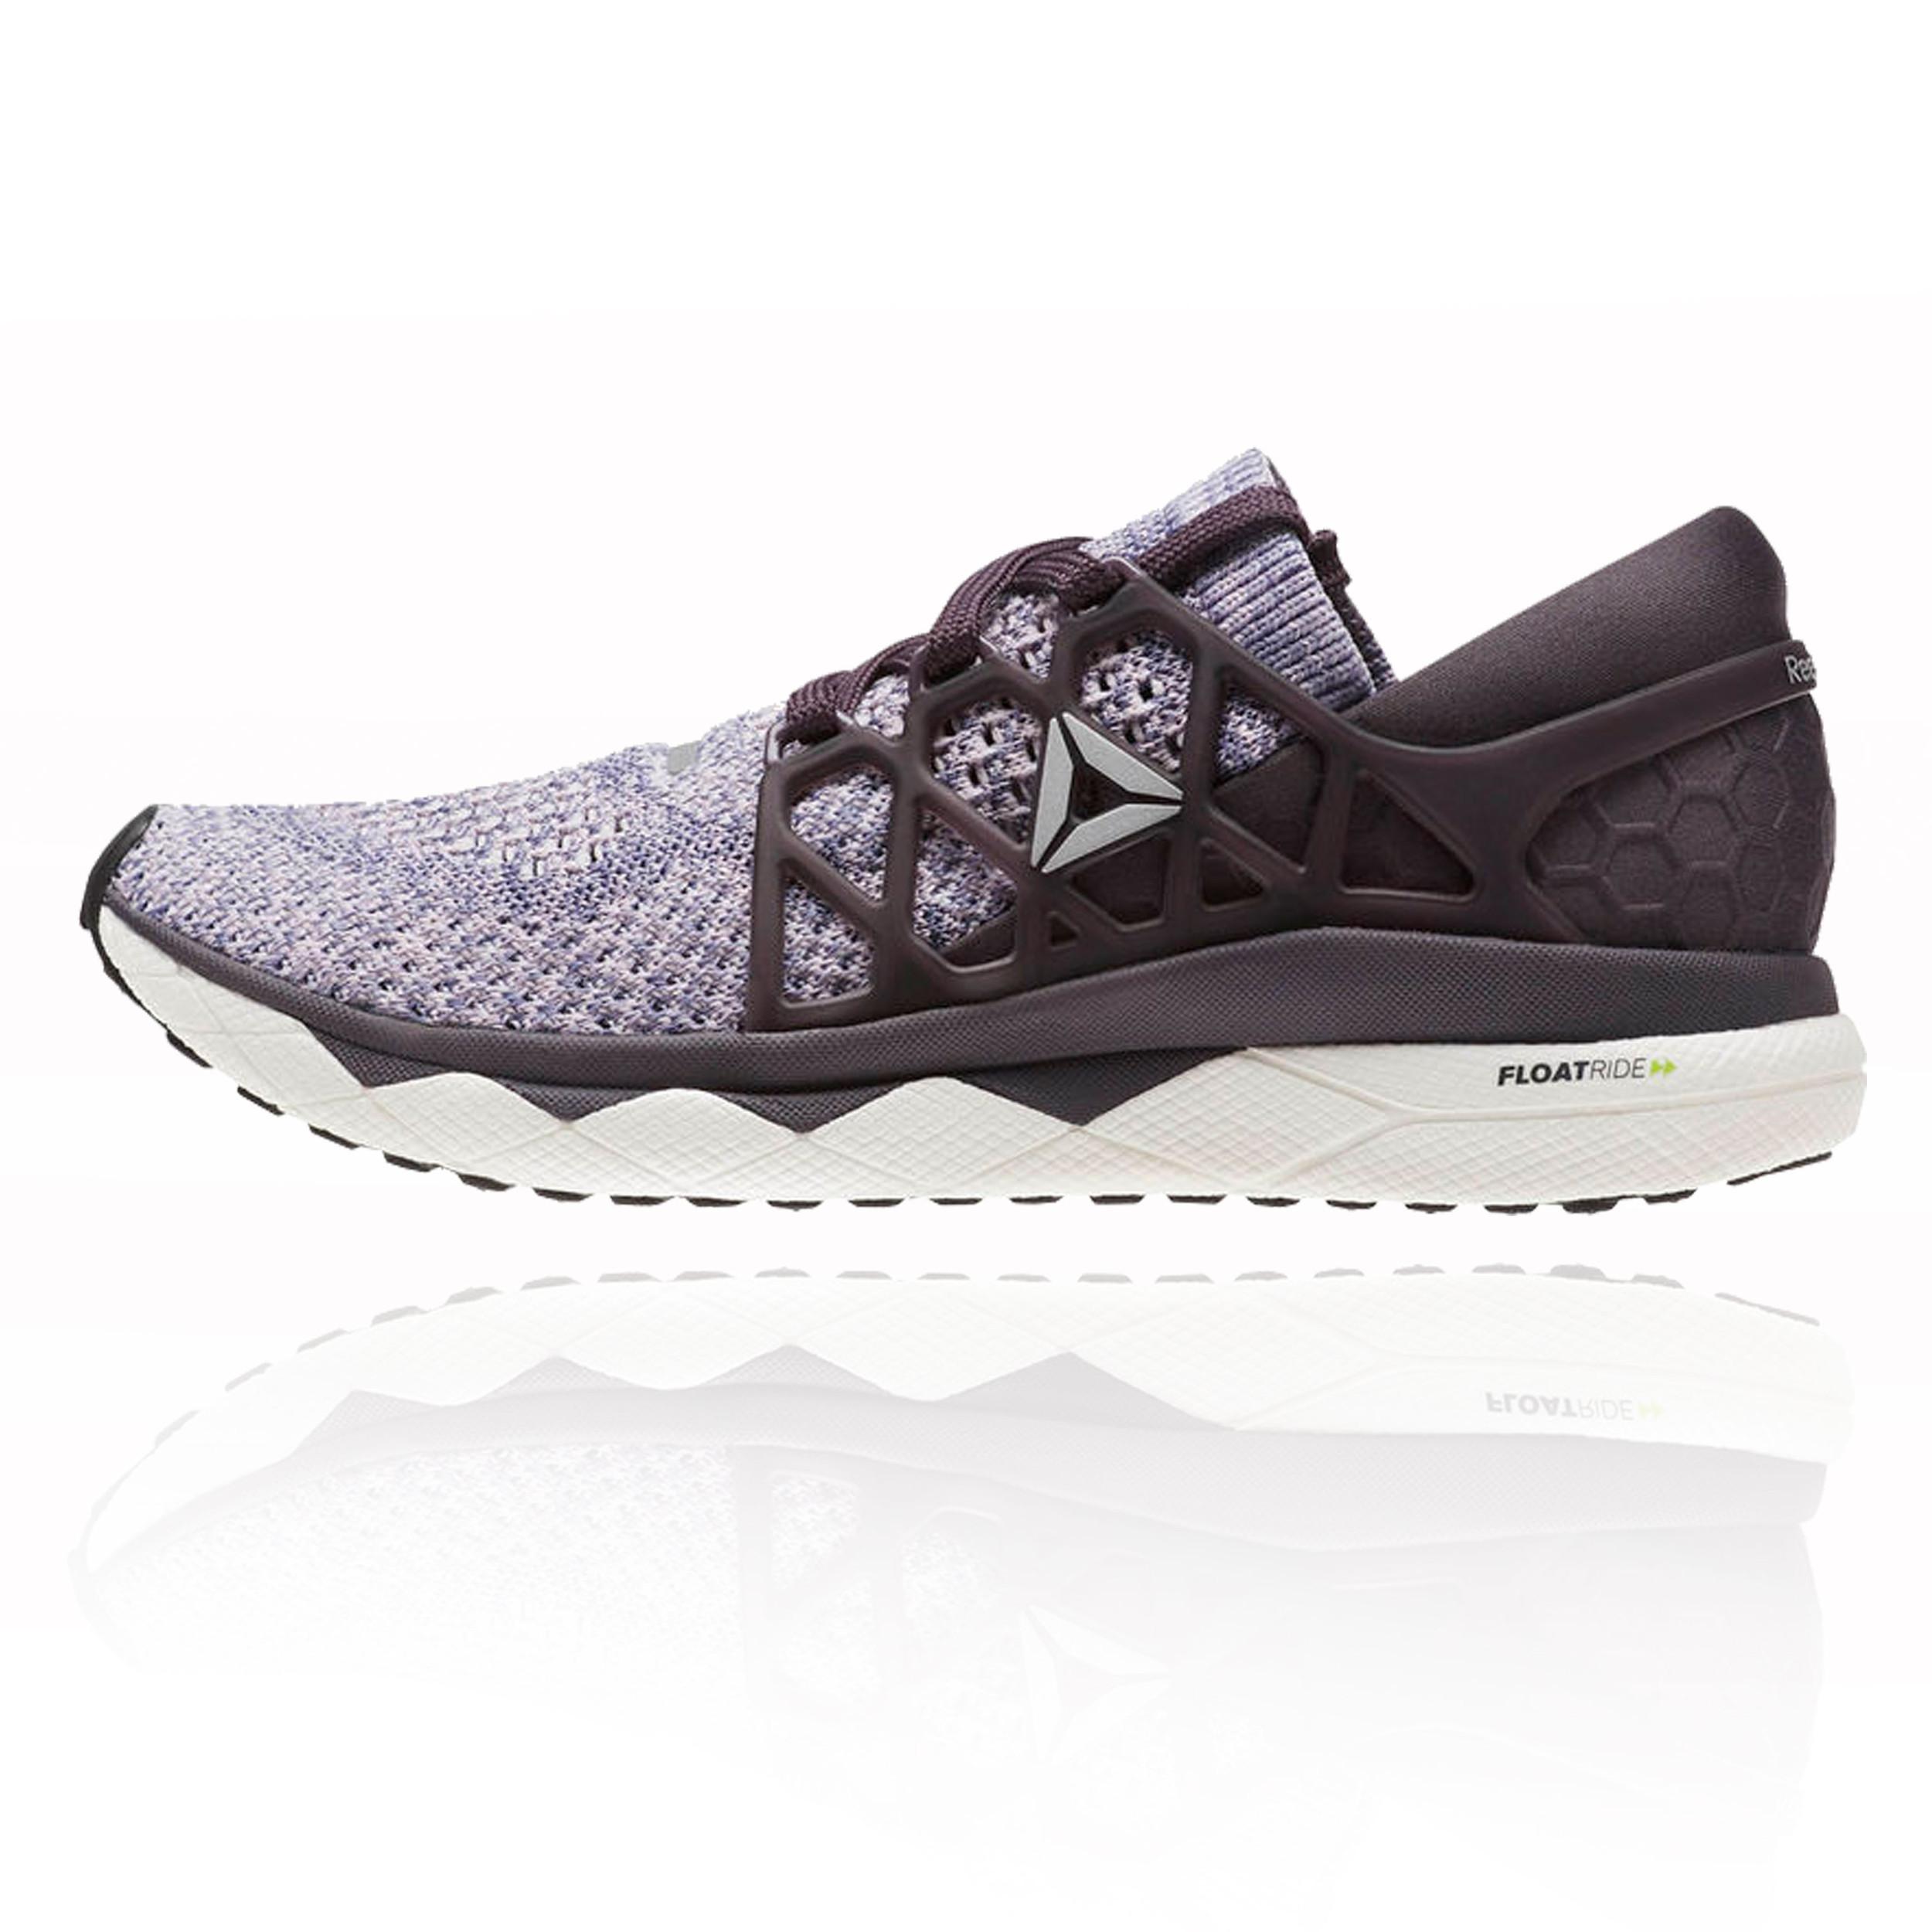 38f387dc942 Details about Reebok Womens Floatride Run Ultraknit Running Shoes Trainers Sneakers  Purple